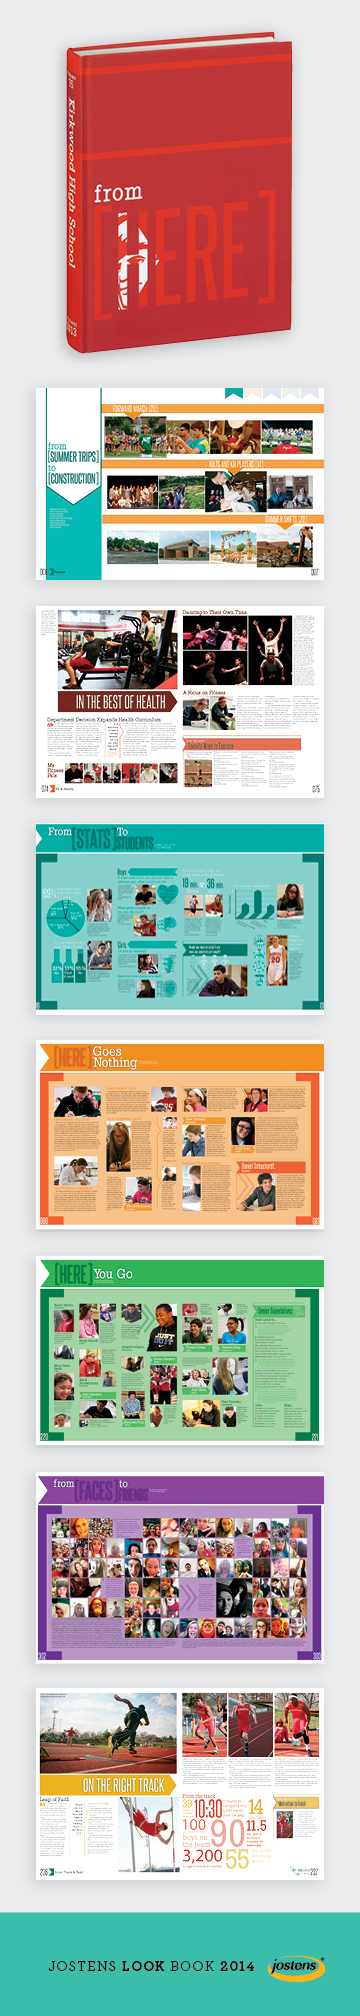 #Jahrbuch drucken #Schule #Jahrbücher #Ideen #Design #Gestaltung #Inspiration #Cover #Yearbook [Pioneer, Kirkwood High School, Kirkwood, MO] #YBKlove